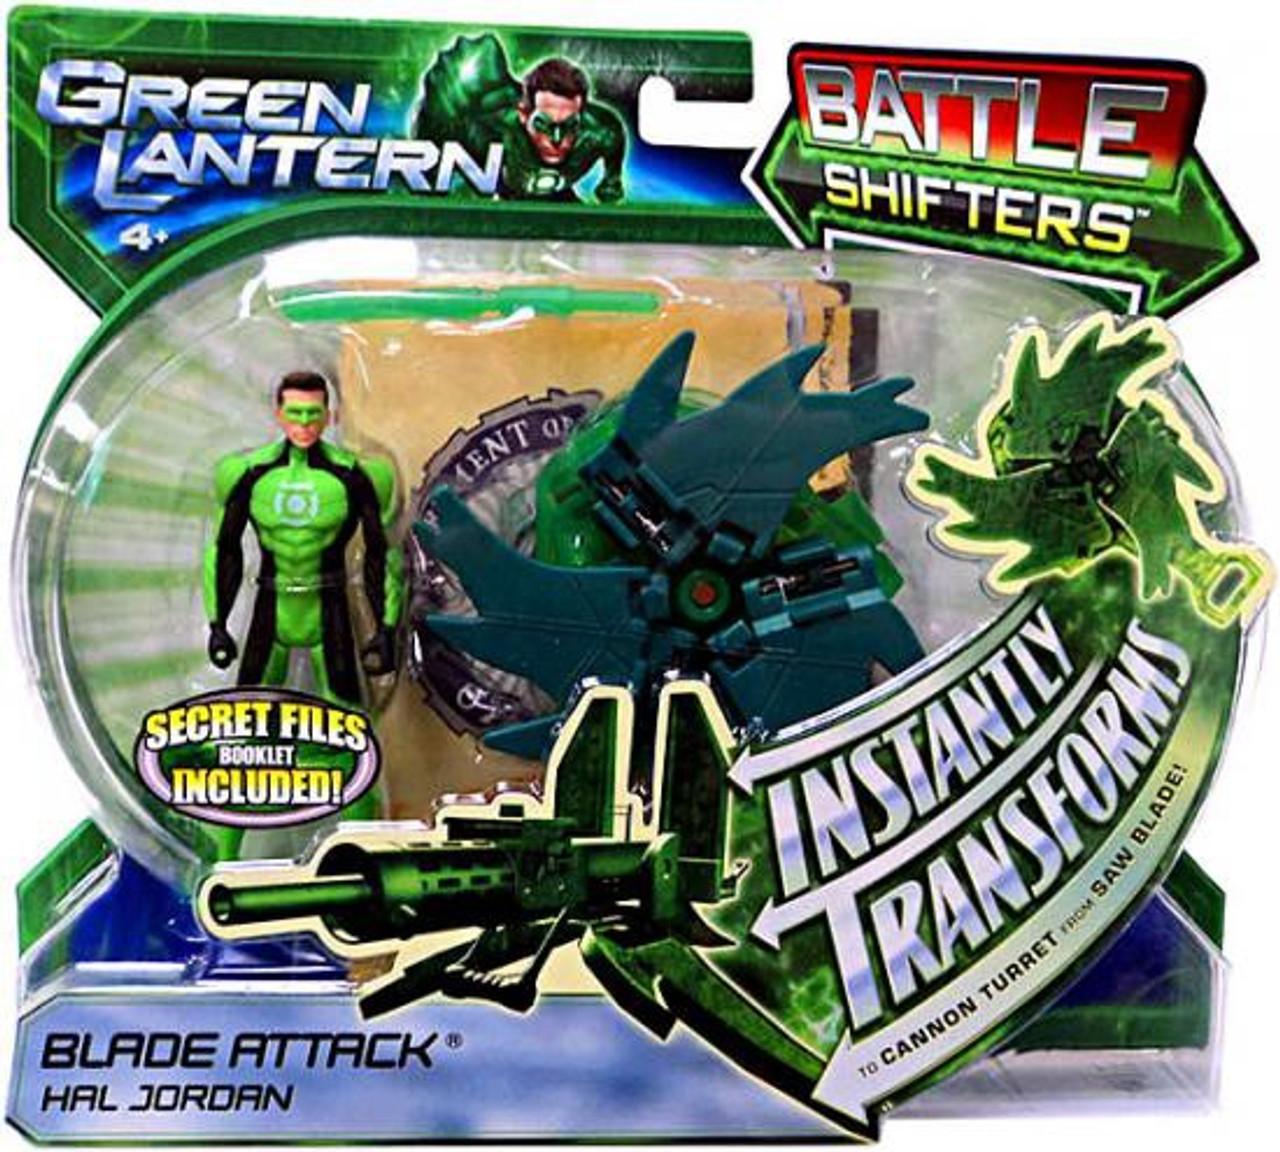 Green Lantern Movie Battle Shifters Hal Jordan Action Figure [Blade Attack]